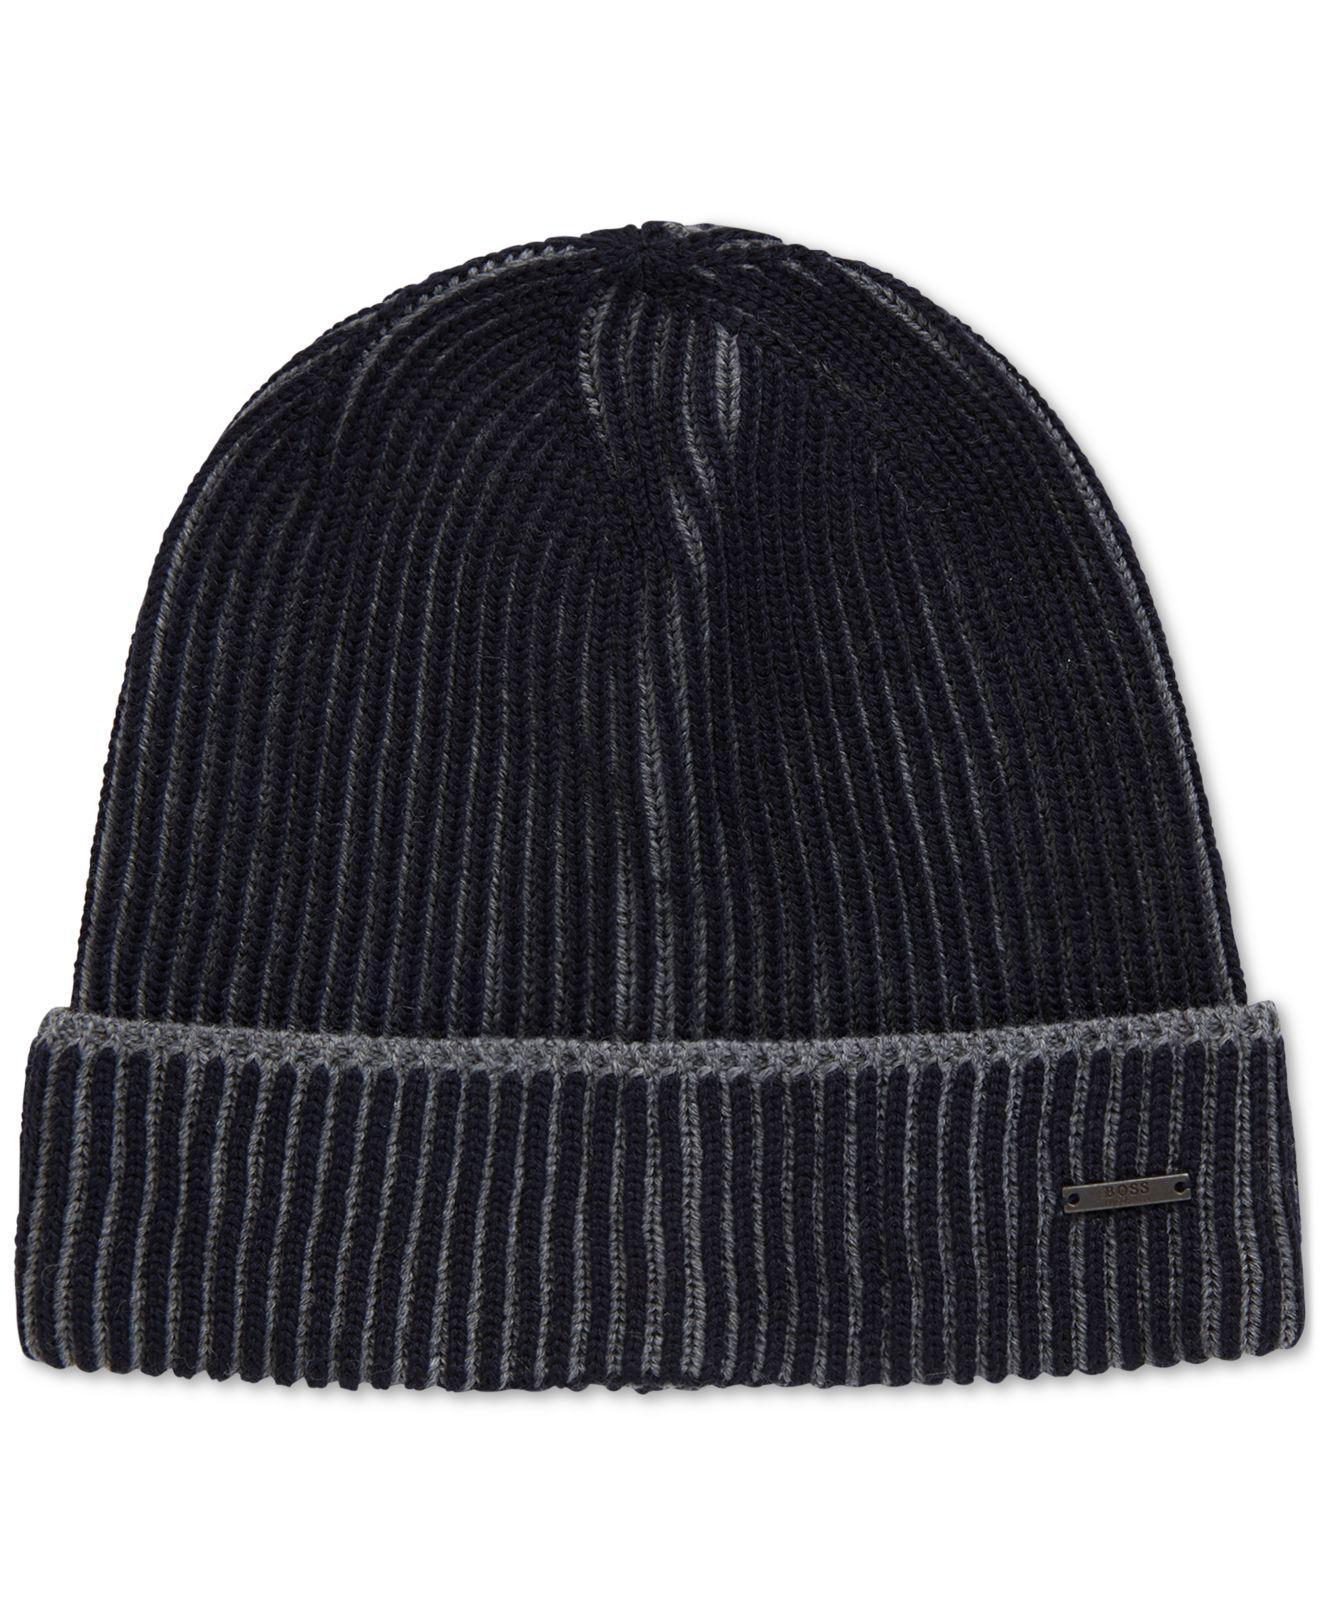 c3d31d7a9f6 Lyst - BOSS Knitted Virgin Wool Beanie Hat in Blue for Men